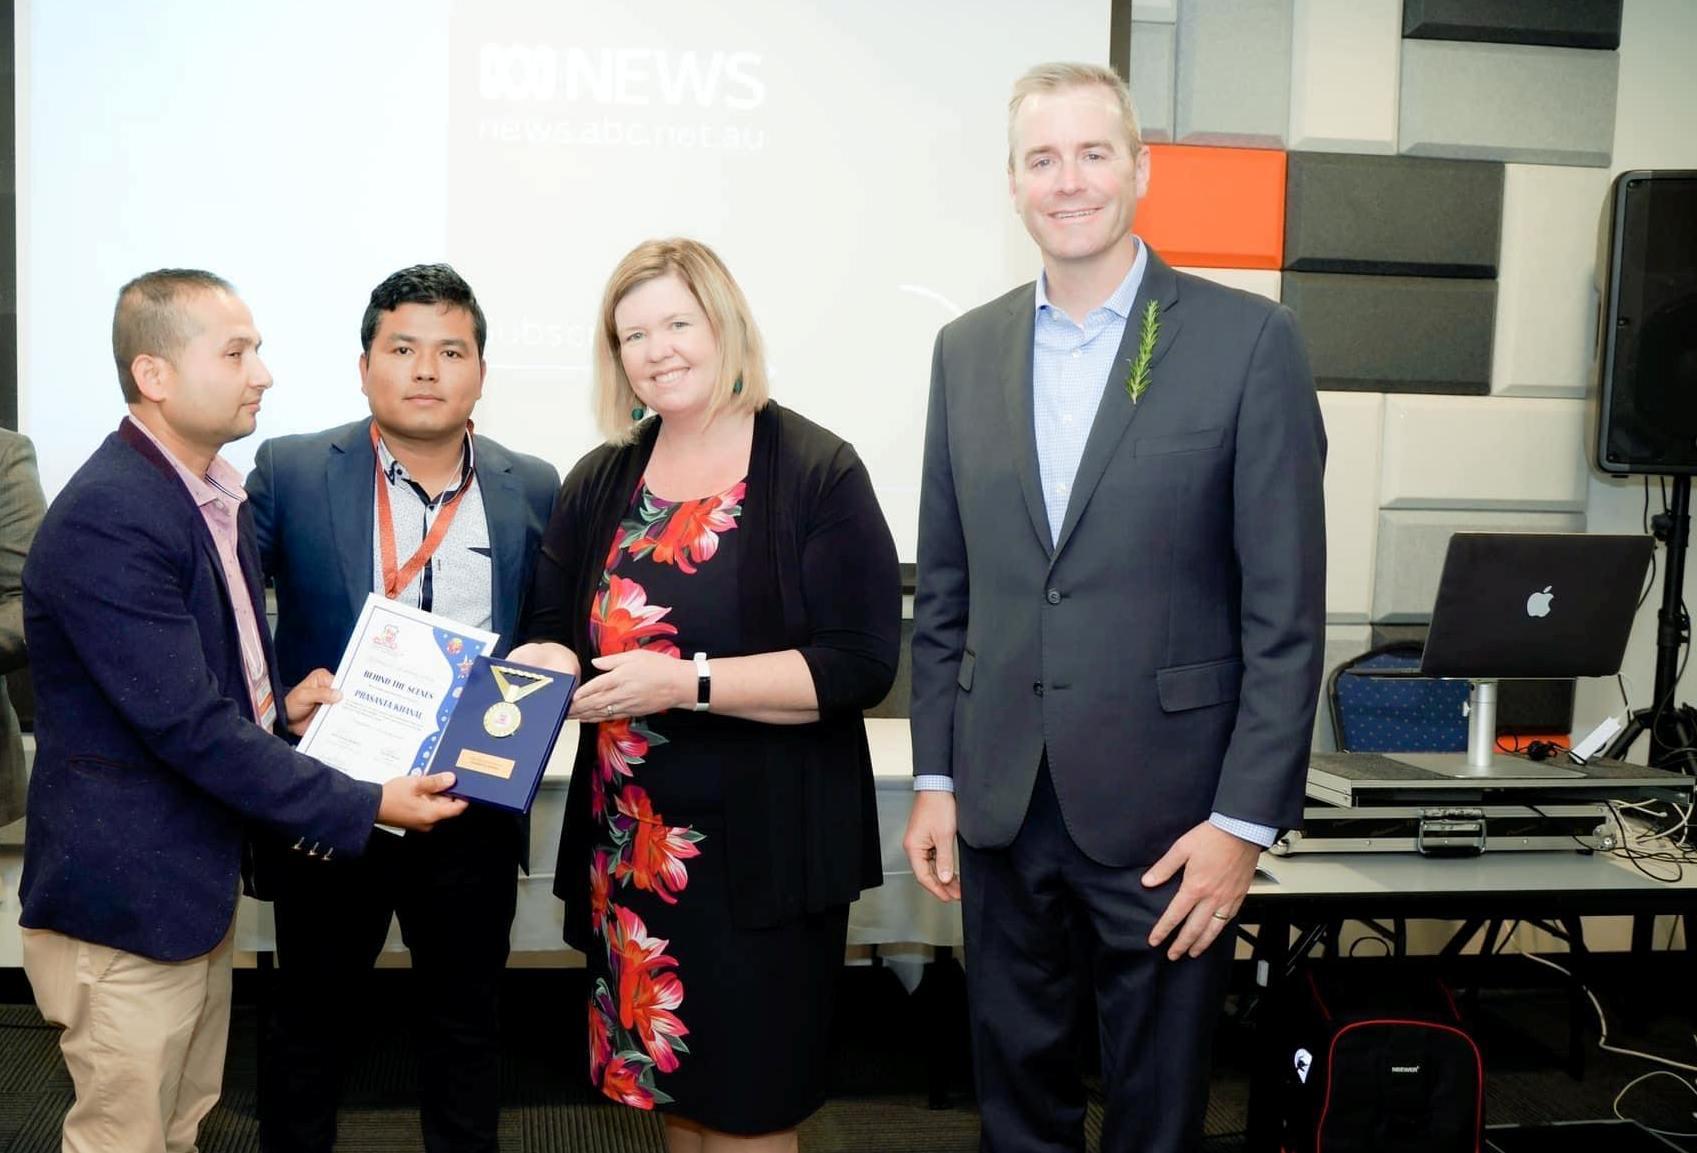 Liberal leaders assure Launceston Nepalese Cricket Club to help build stadium